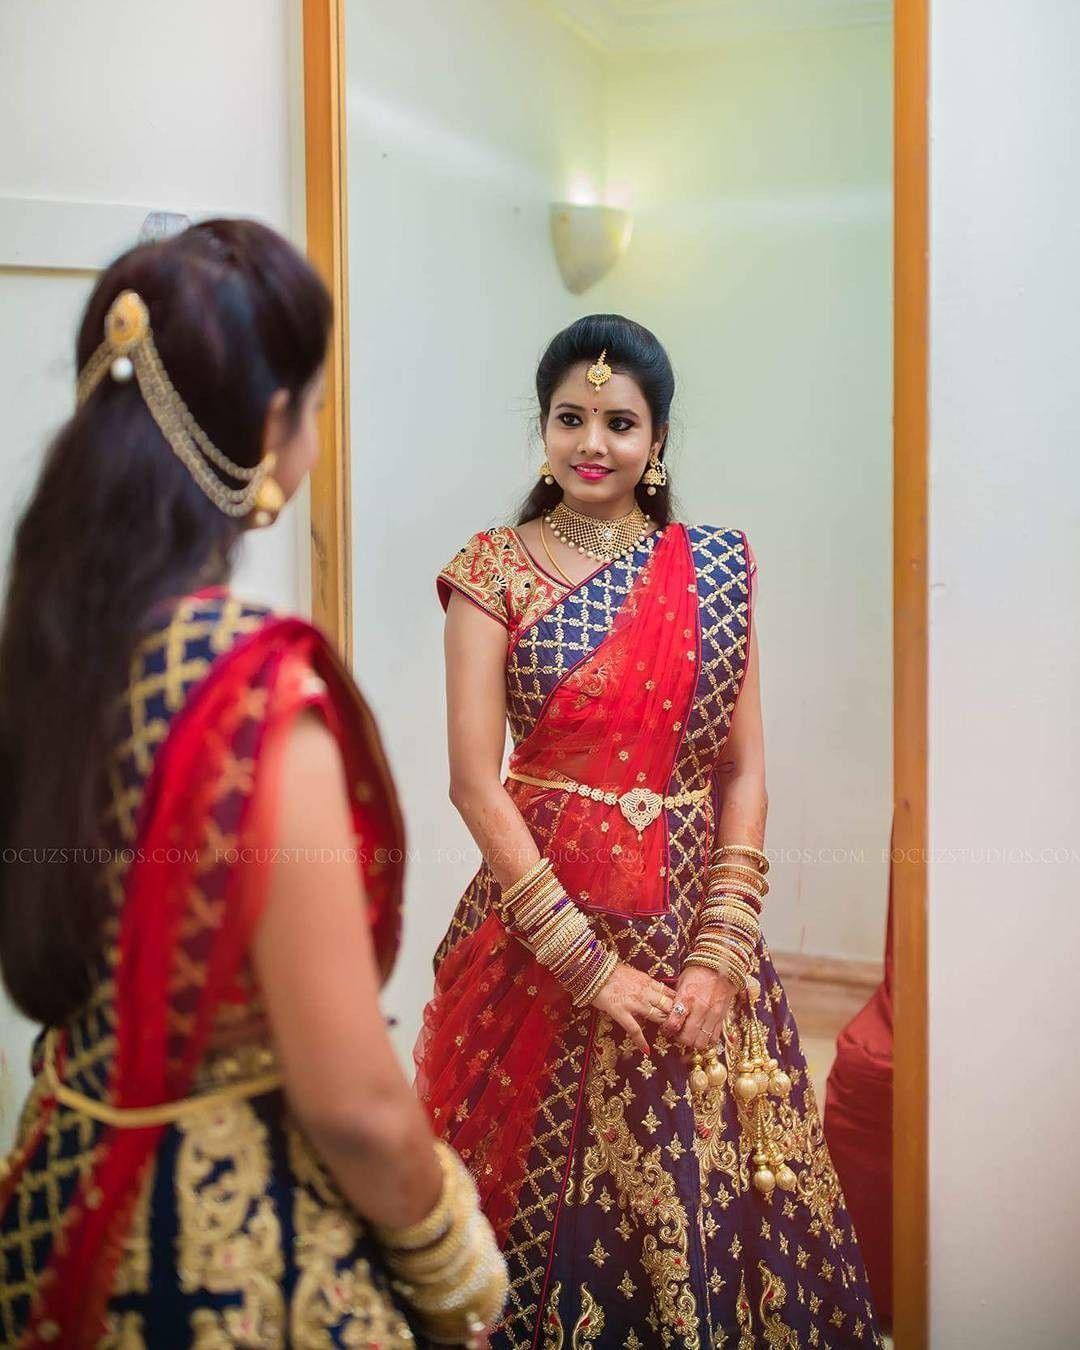 Hairstyle For Bride On Saree: Designer Lehenga Wearing Style - Mattal - Pose